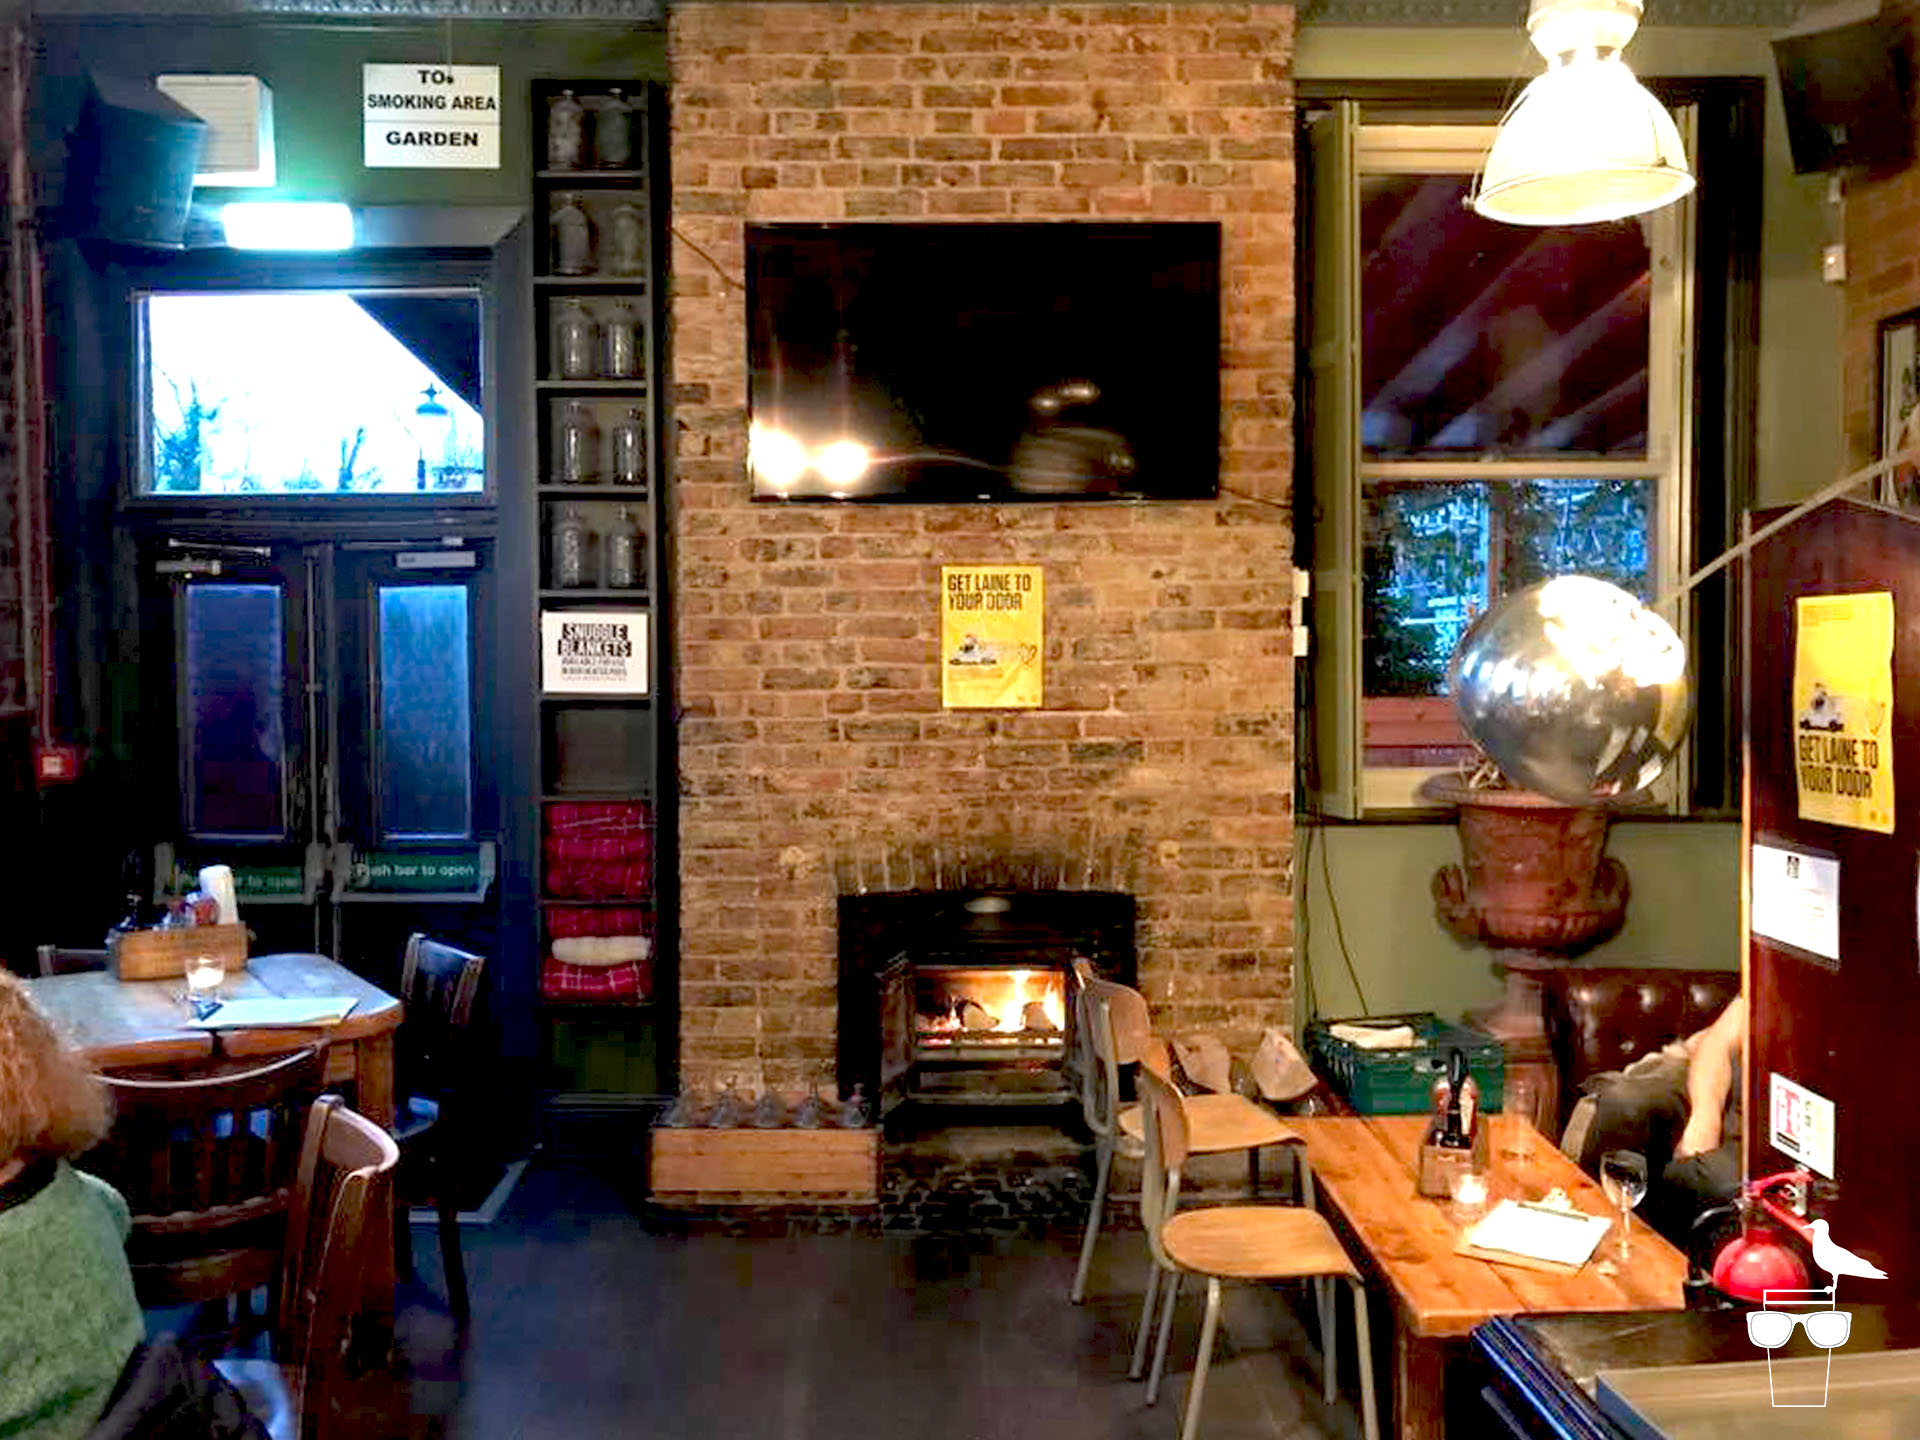 open house pub london road brighton log fire